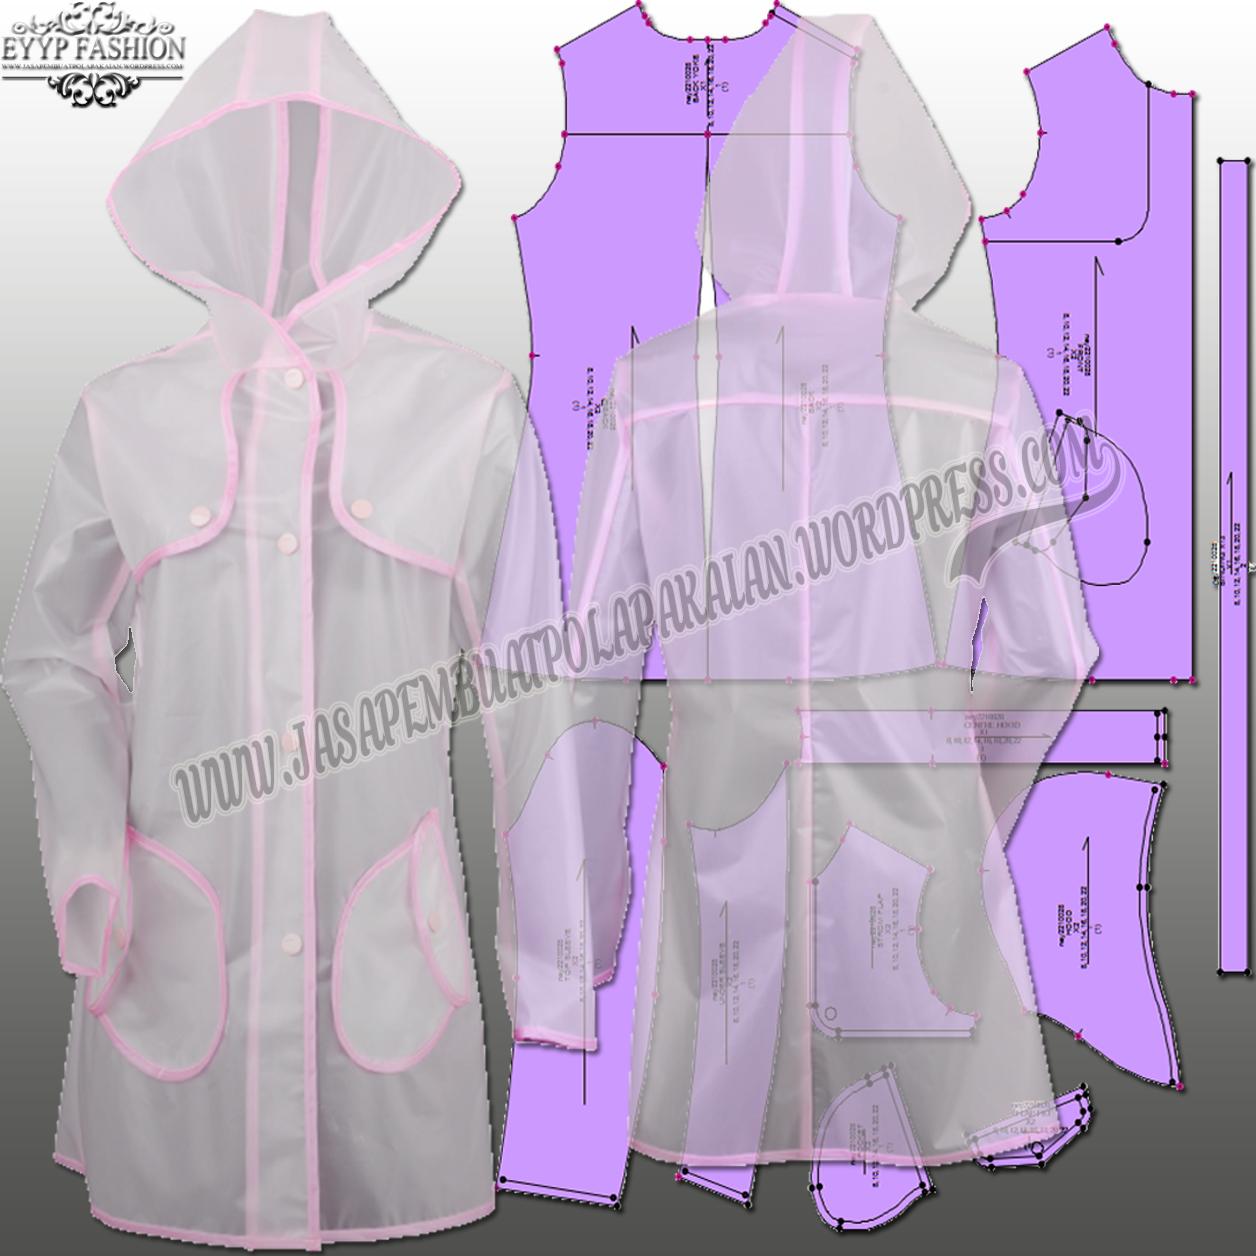 Poncho code ney2210028 Pattern fashion, Fashion, Dress